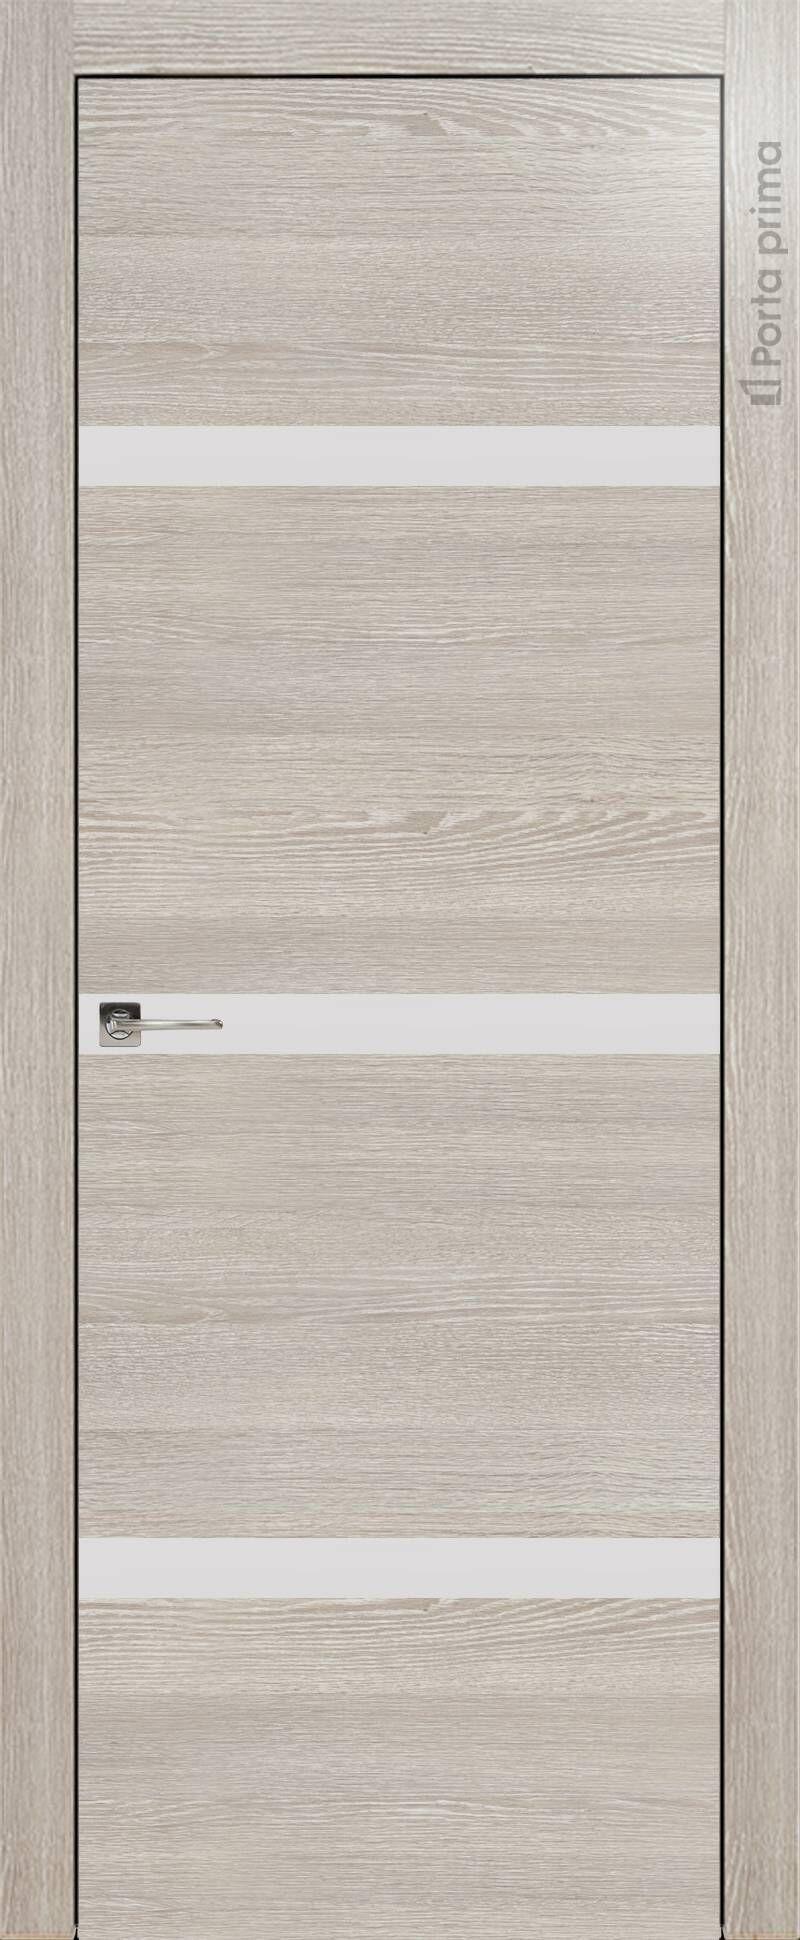 Tivoli Г-4 цвет - Серый дуб Без стекла (ДГ)